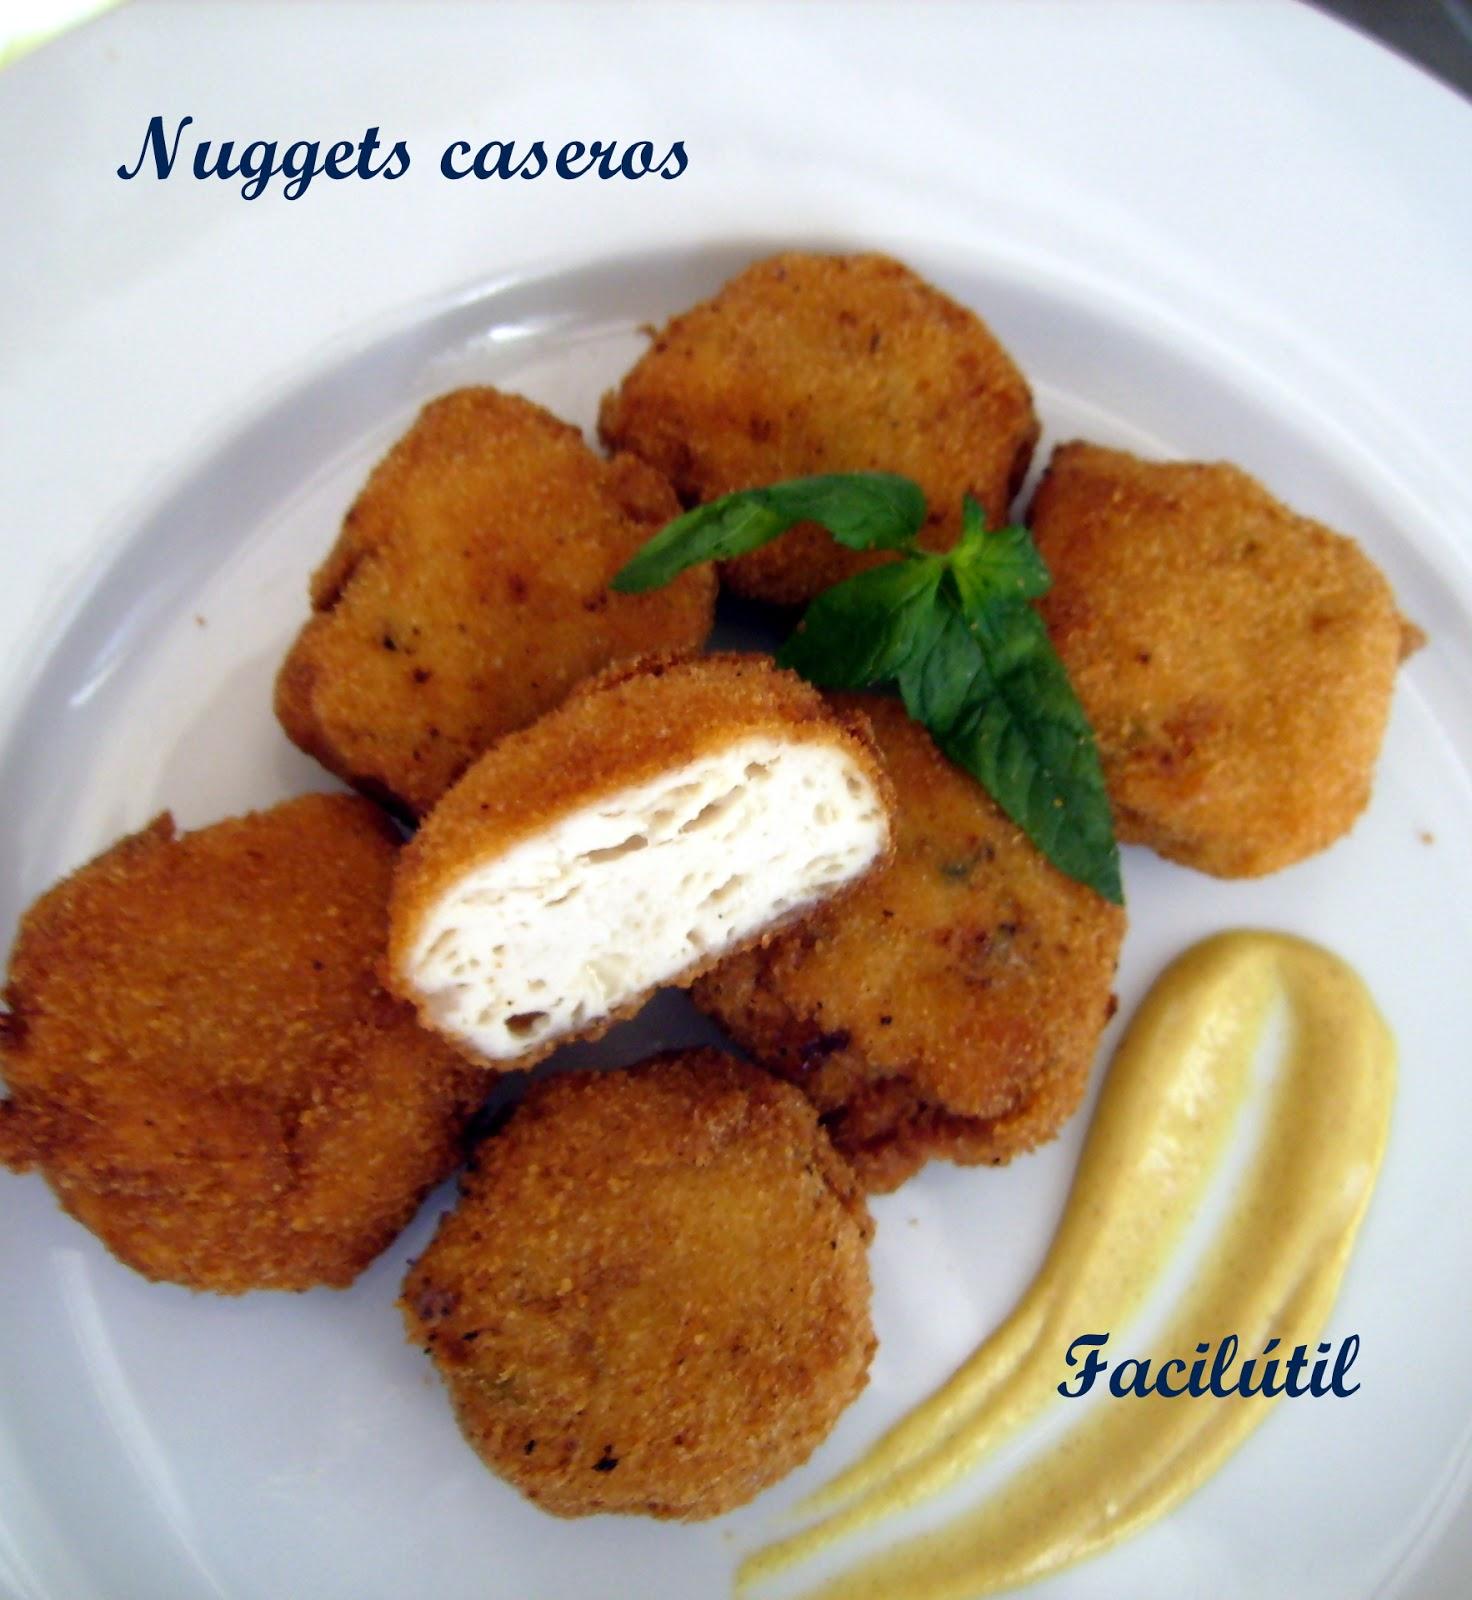 Nuggets Que Son: Facilútil: Nuggets Caseros